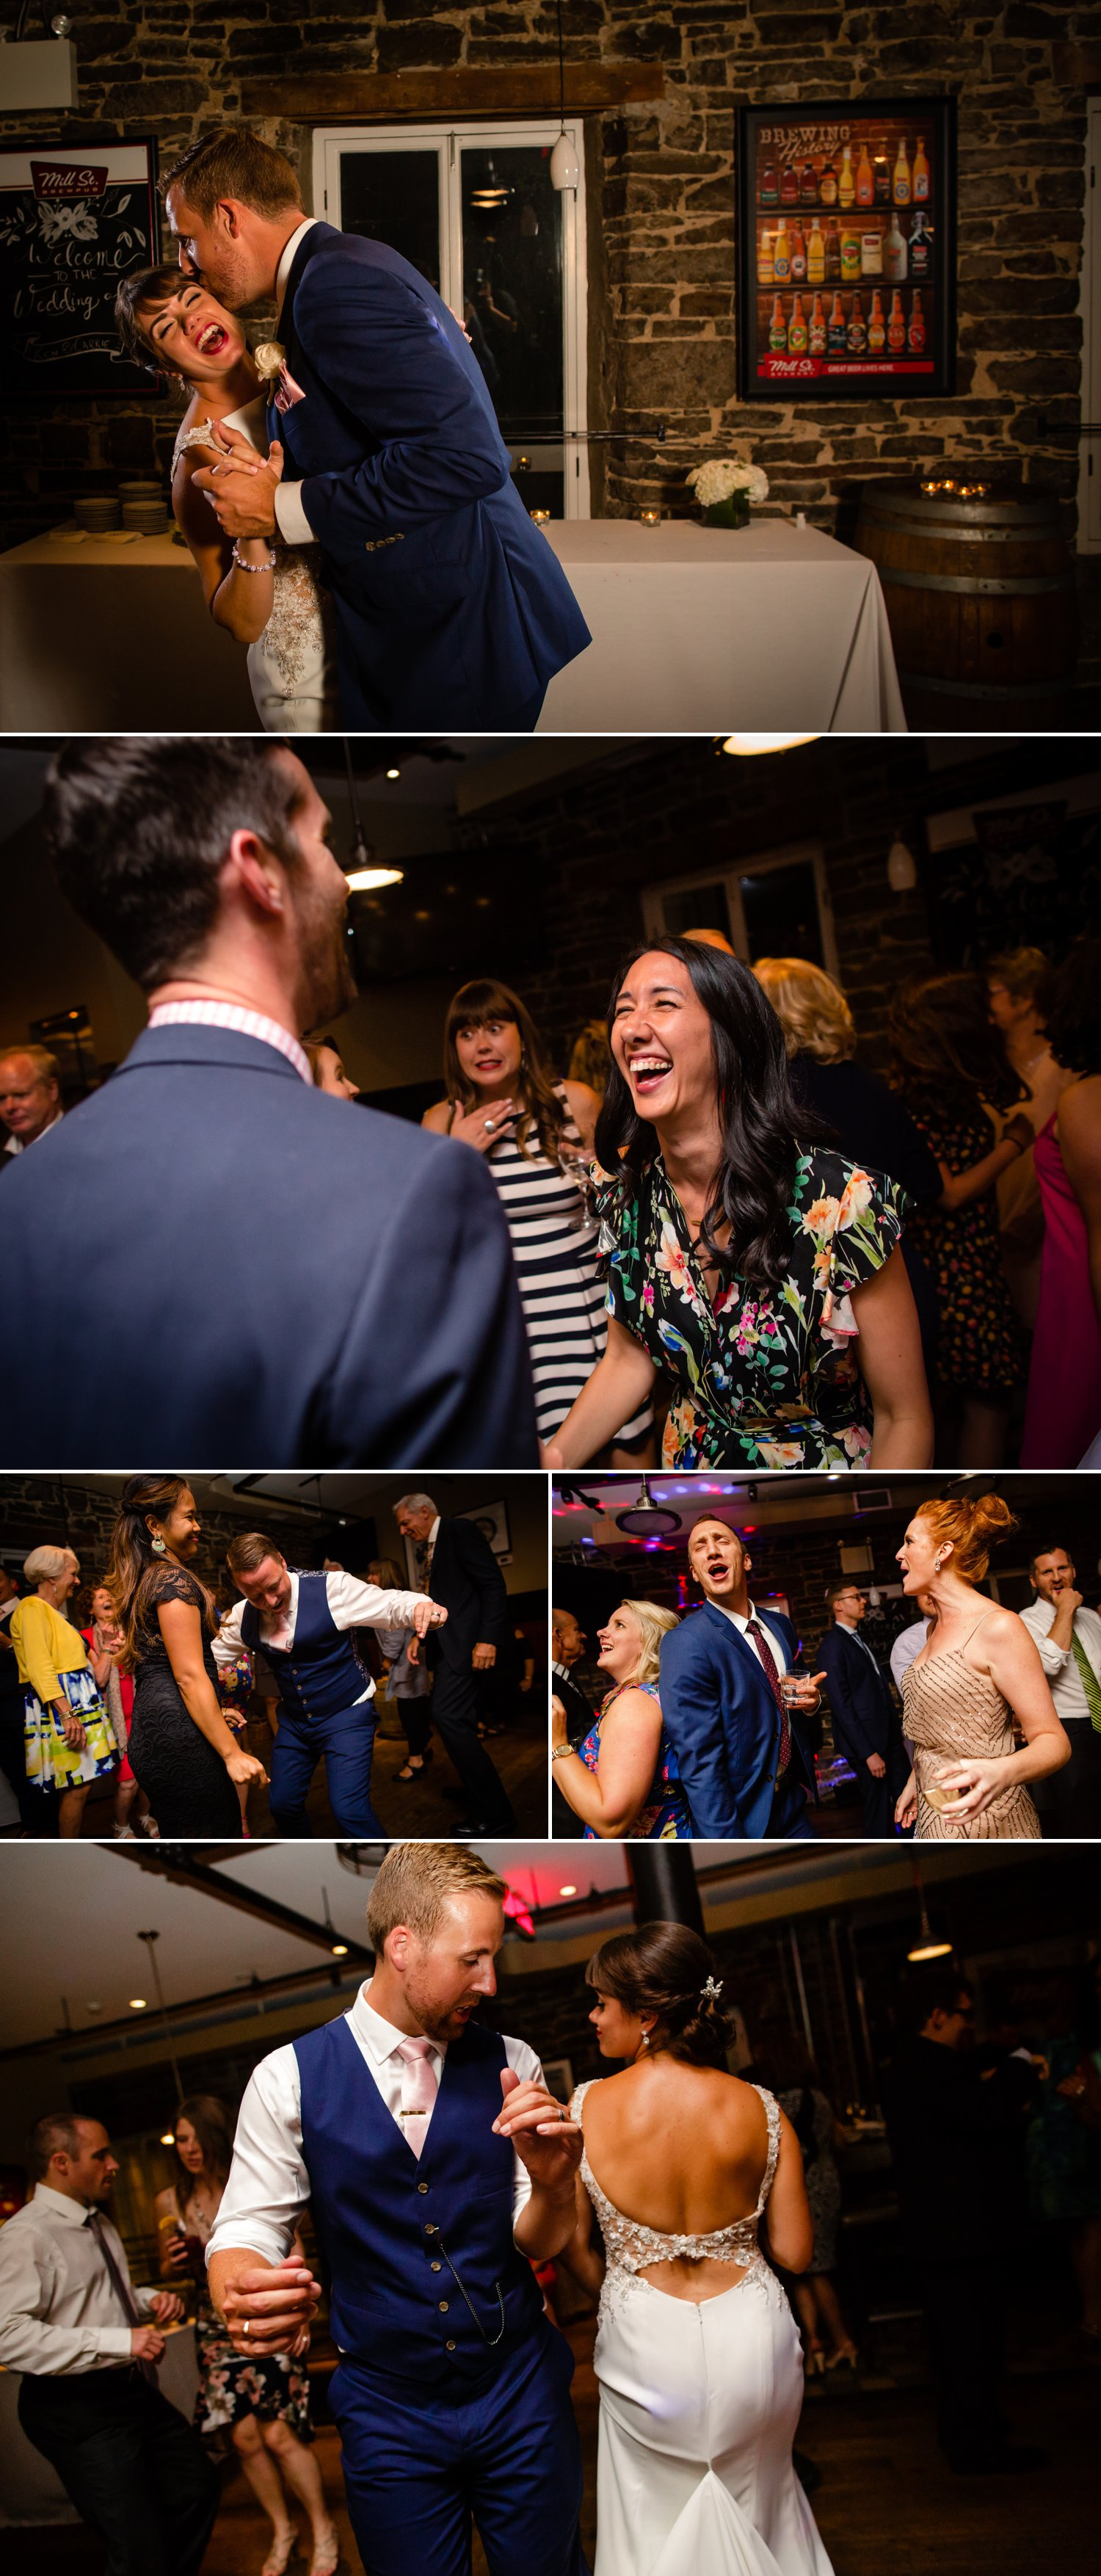 A wedding reception at The Mill St Brew Pub in downtown Ottawa